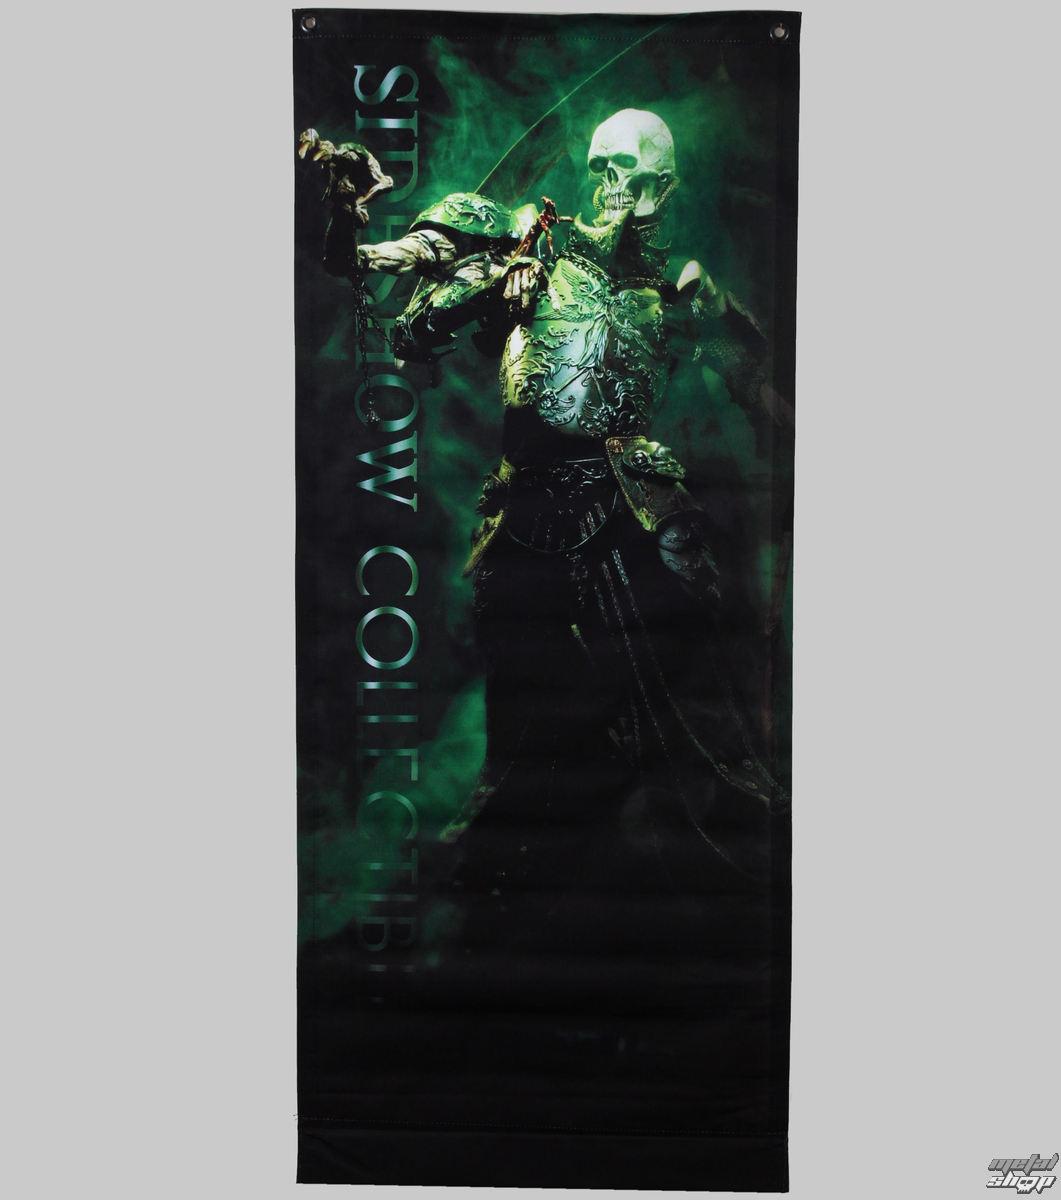 vlajka (baner) The Reaper - 76x183 - SSBAN005L